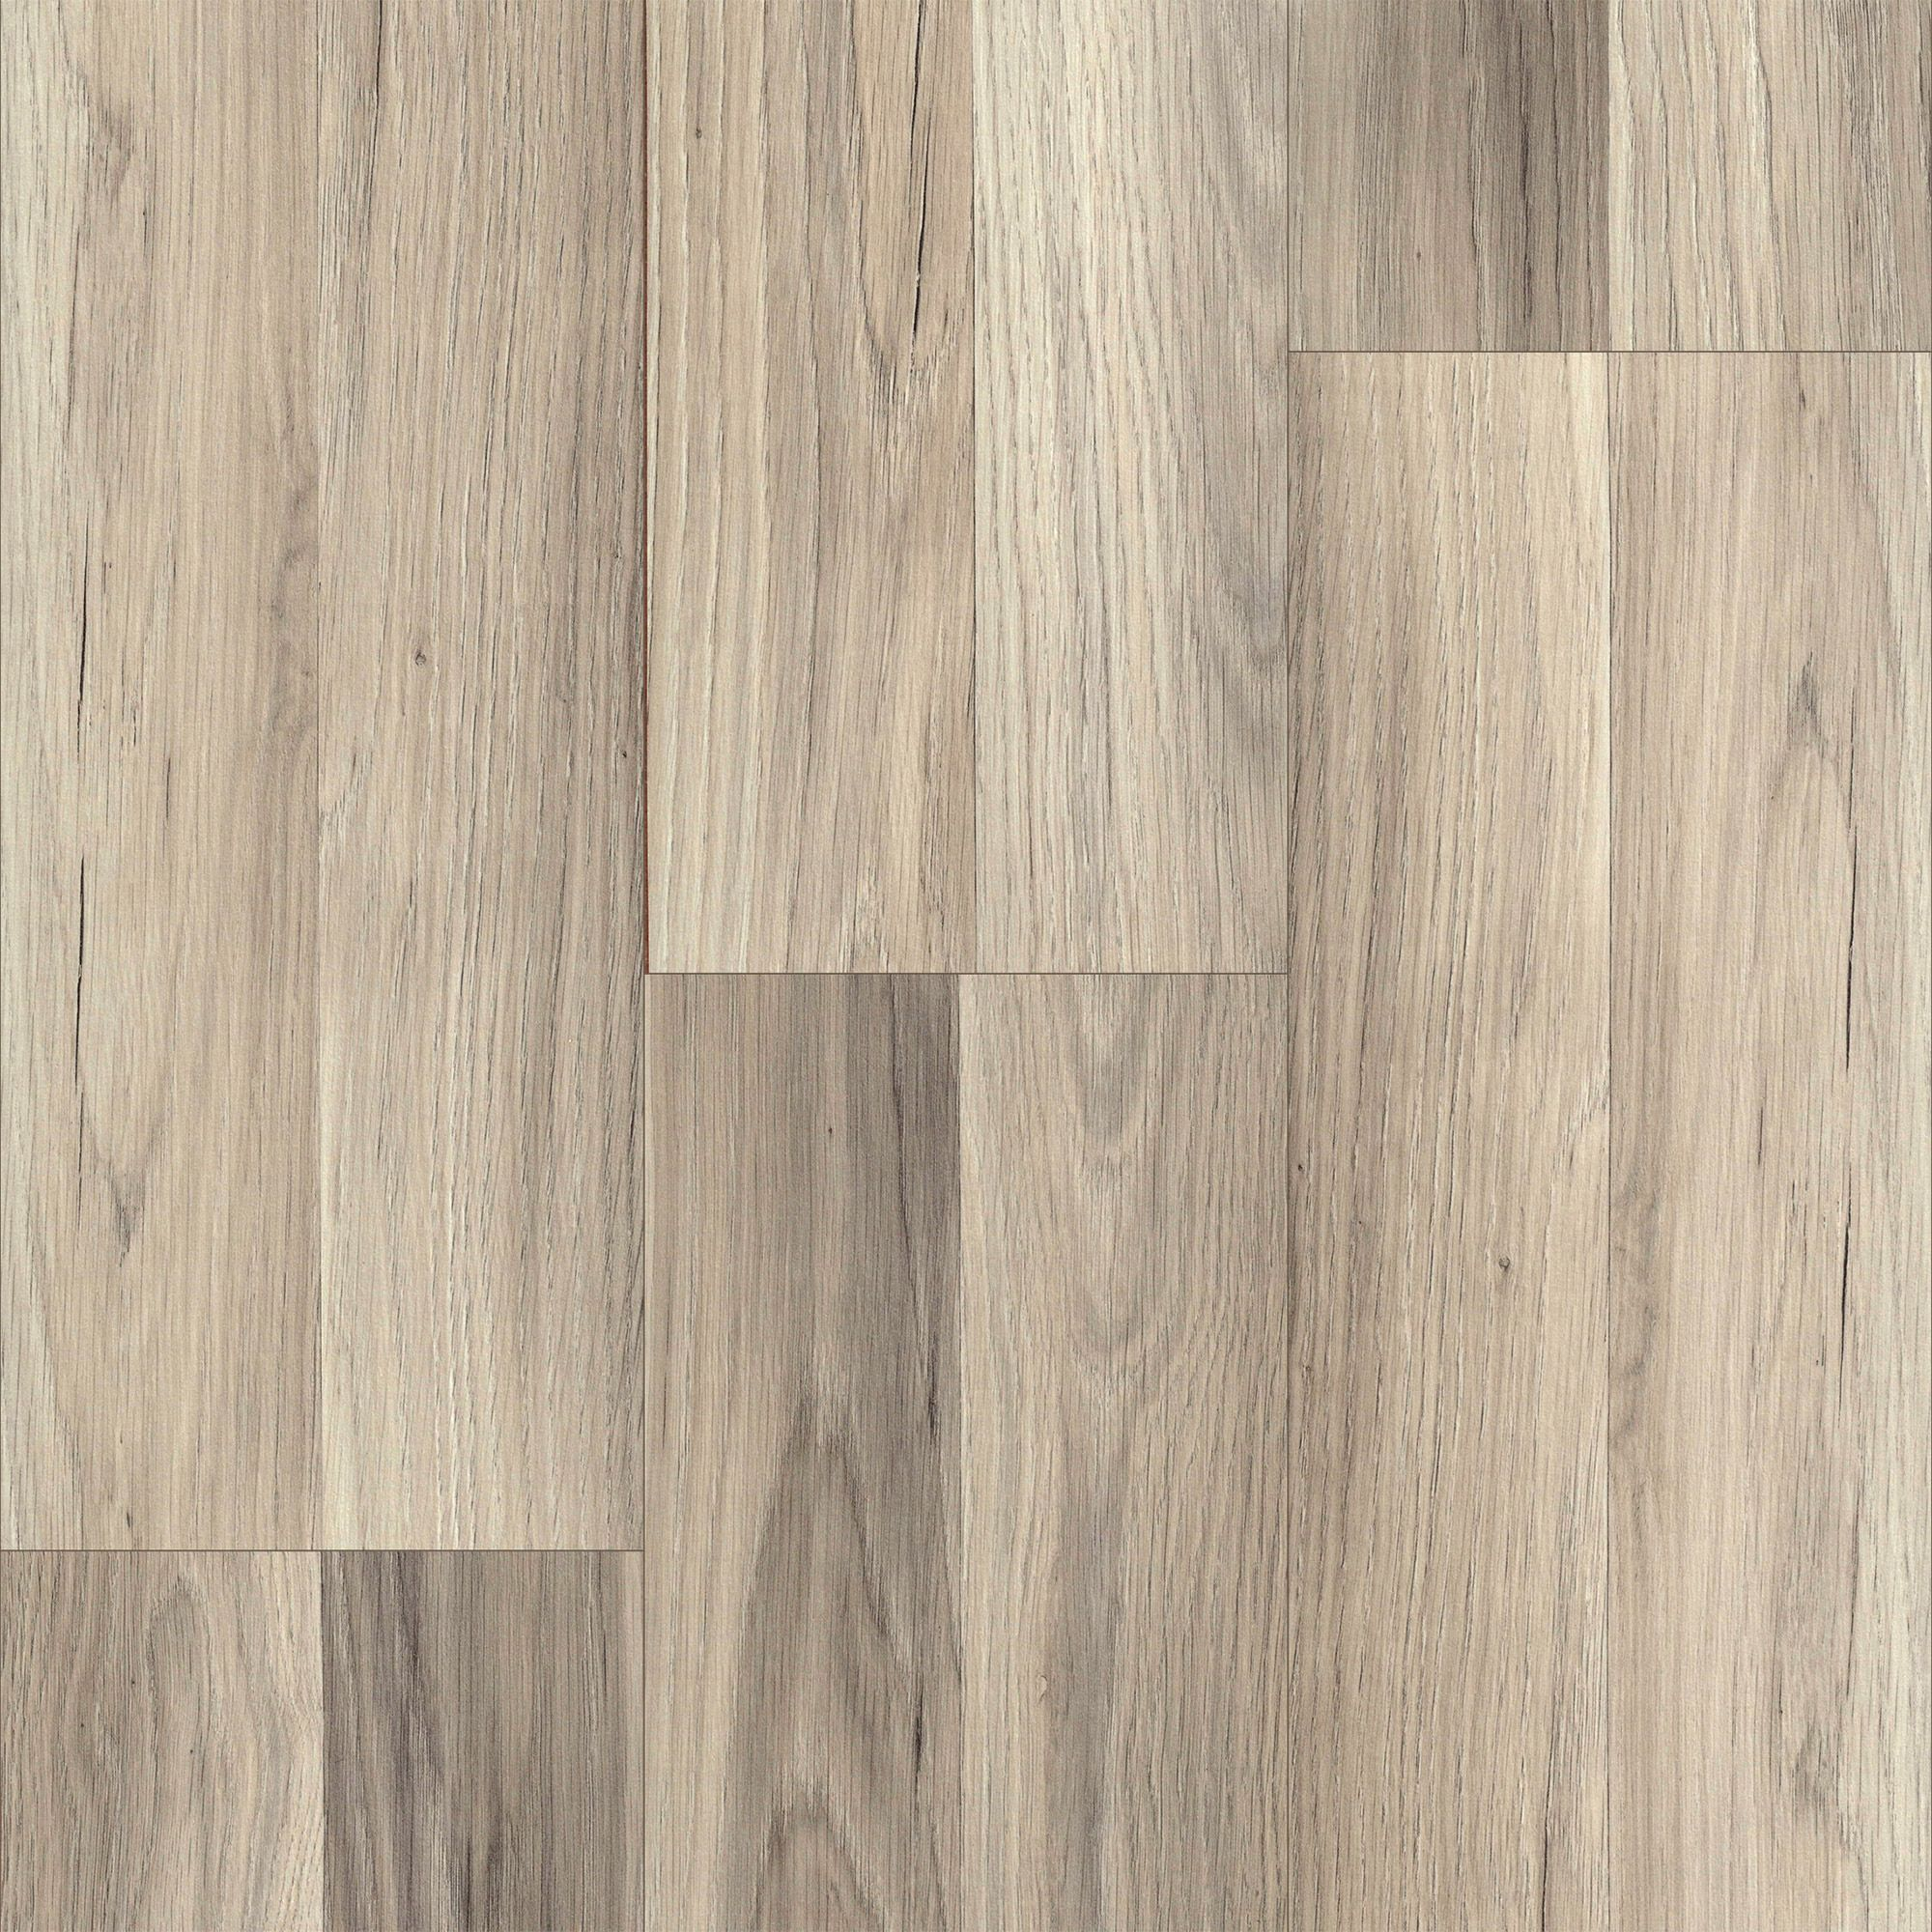 Kronoswiss Nobless Elegance Light Oak 8mm Laminate Flooring